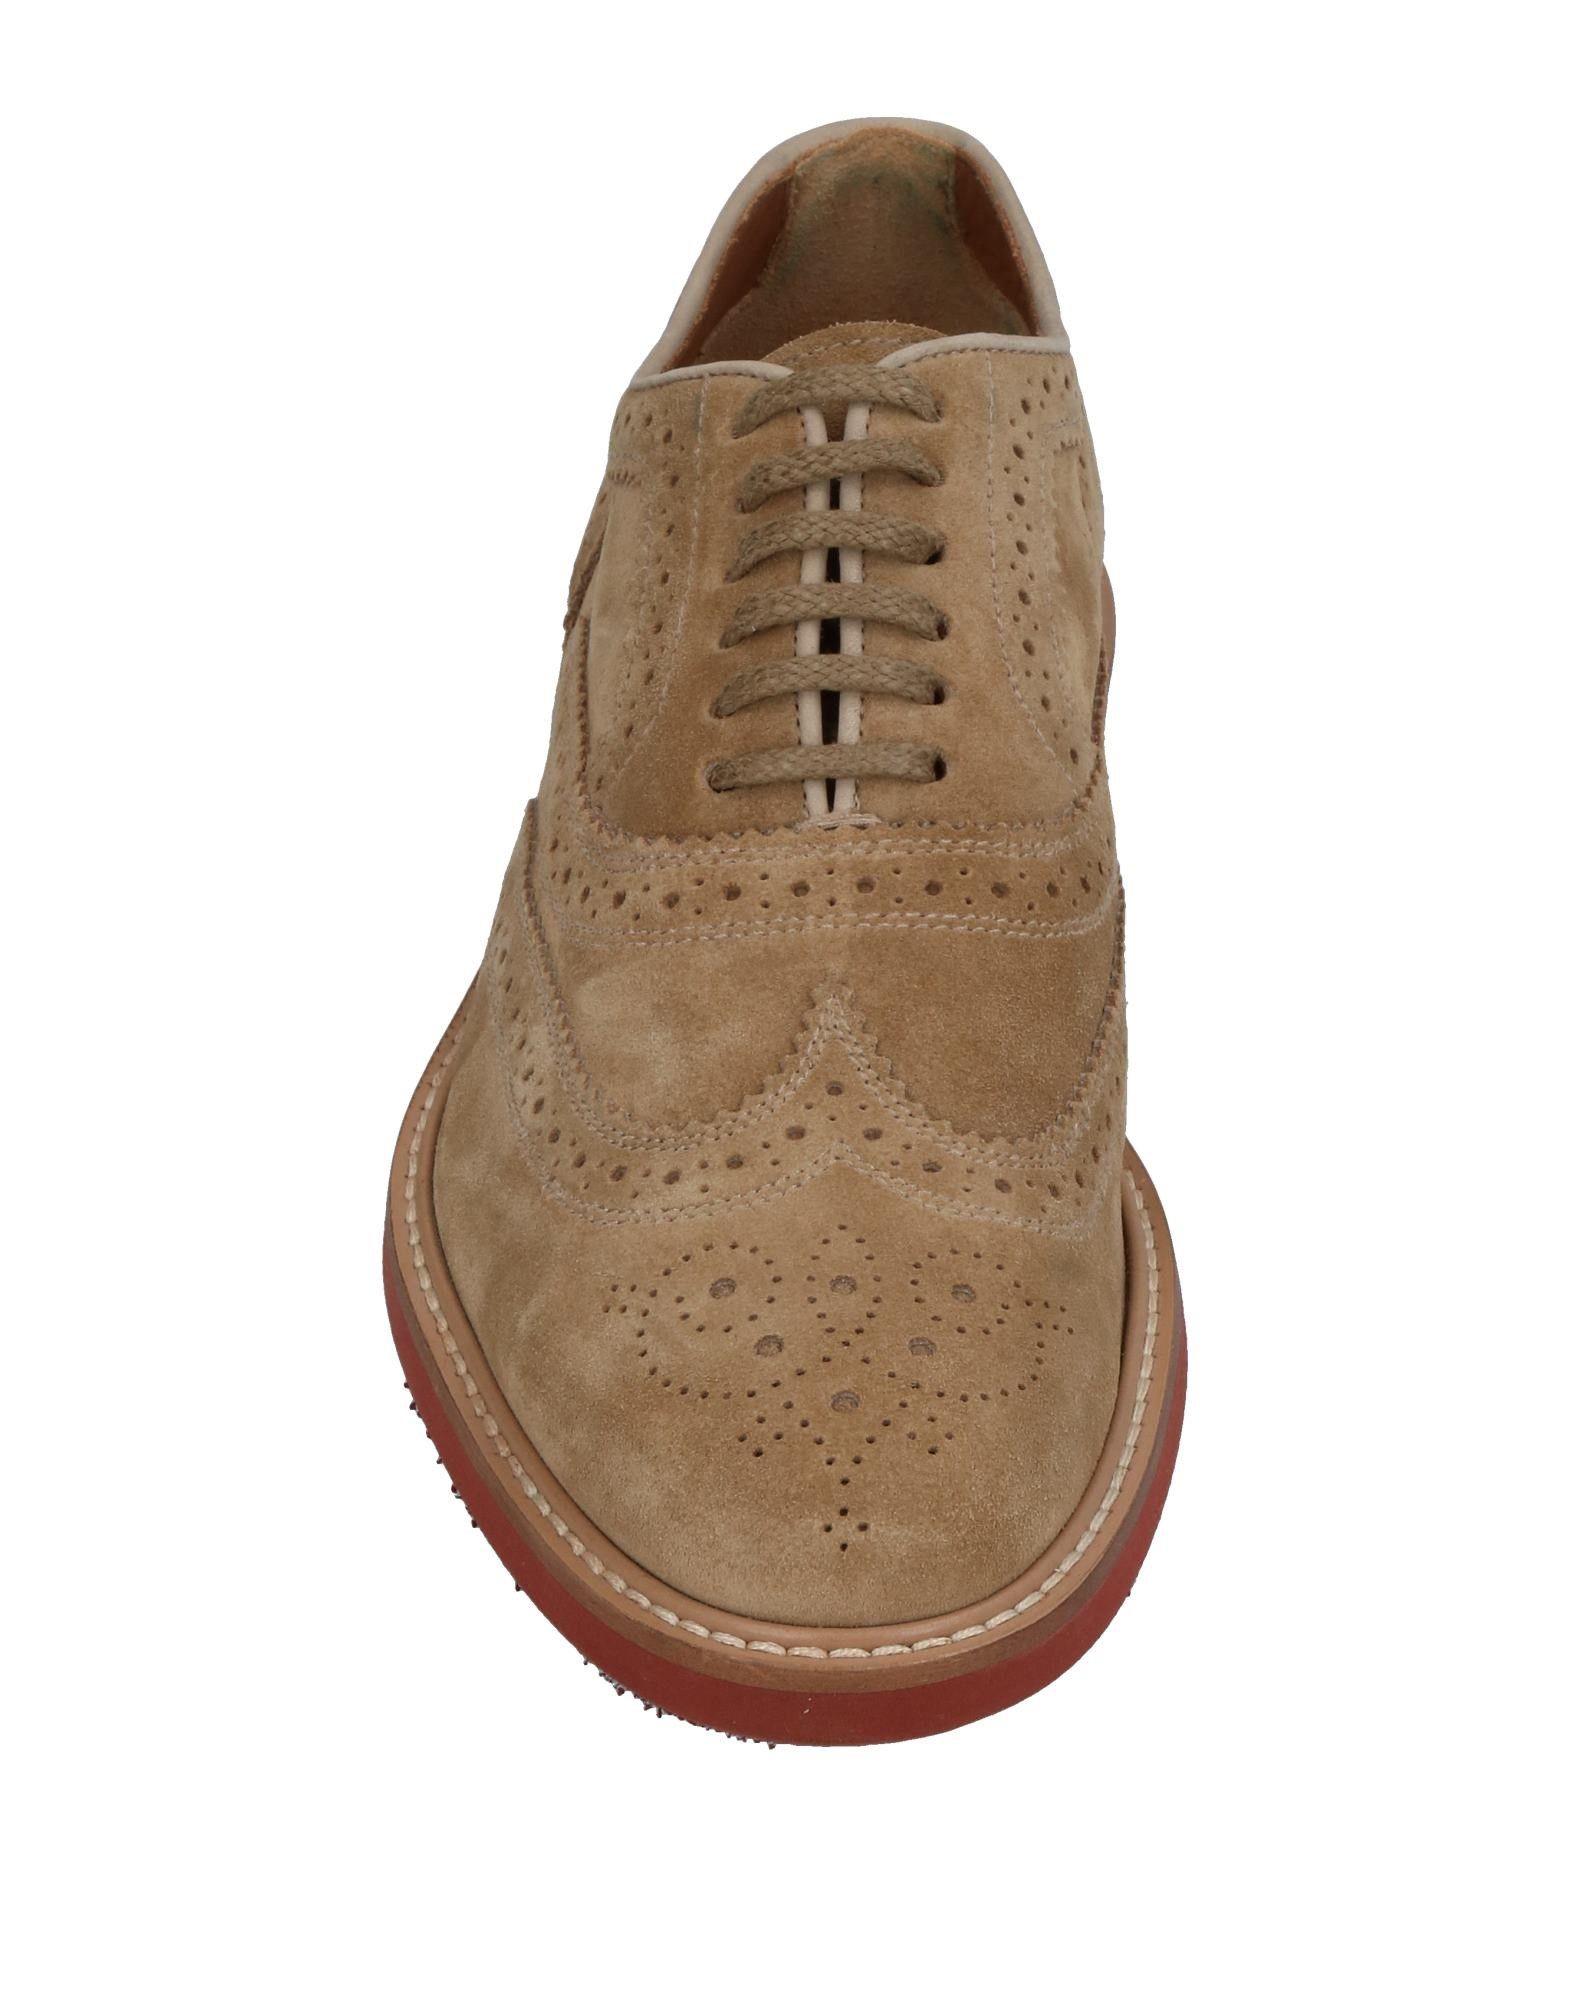 Rabatt echte Schuhe Schnürschuhe Doucal's Schnürschuhe Schuhe Herren  11401381IM 955139